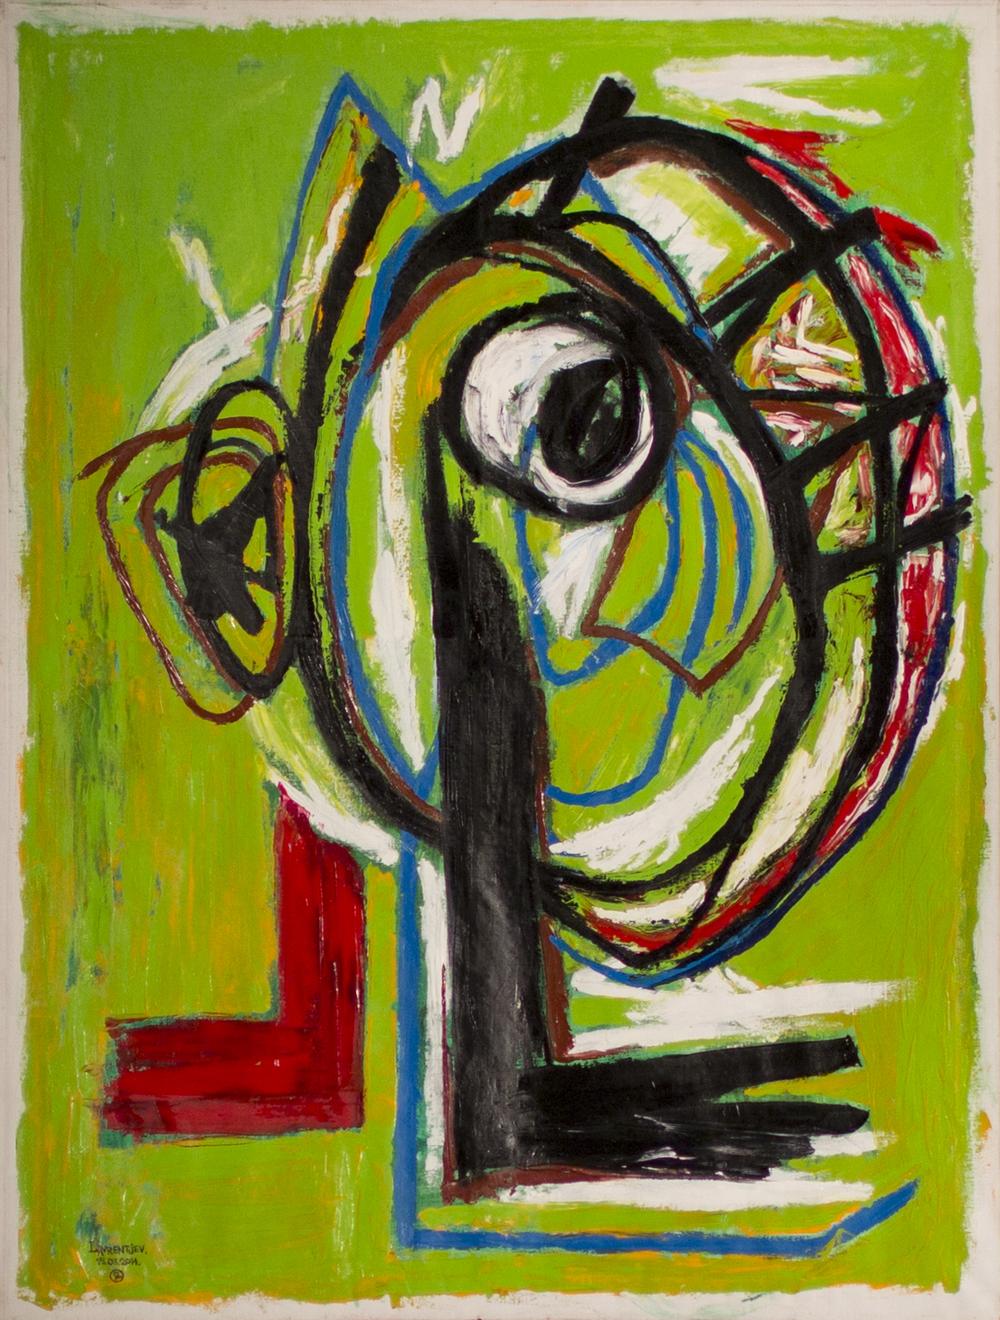 Equilibrio 146x111cm Oil on canvas 2014 3000eiro.jpg